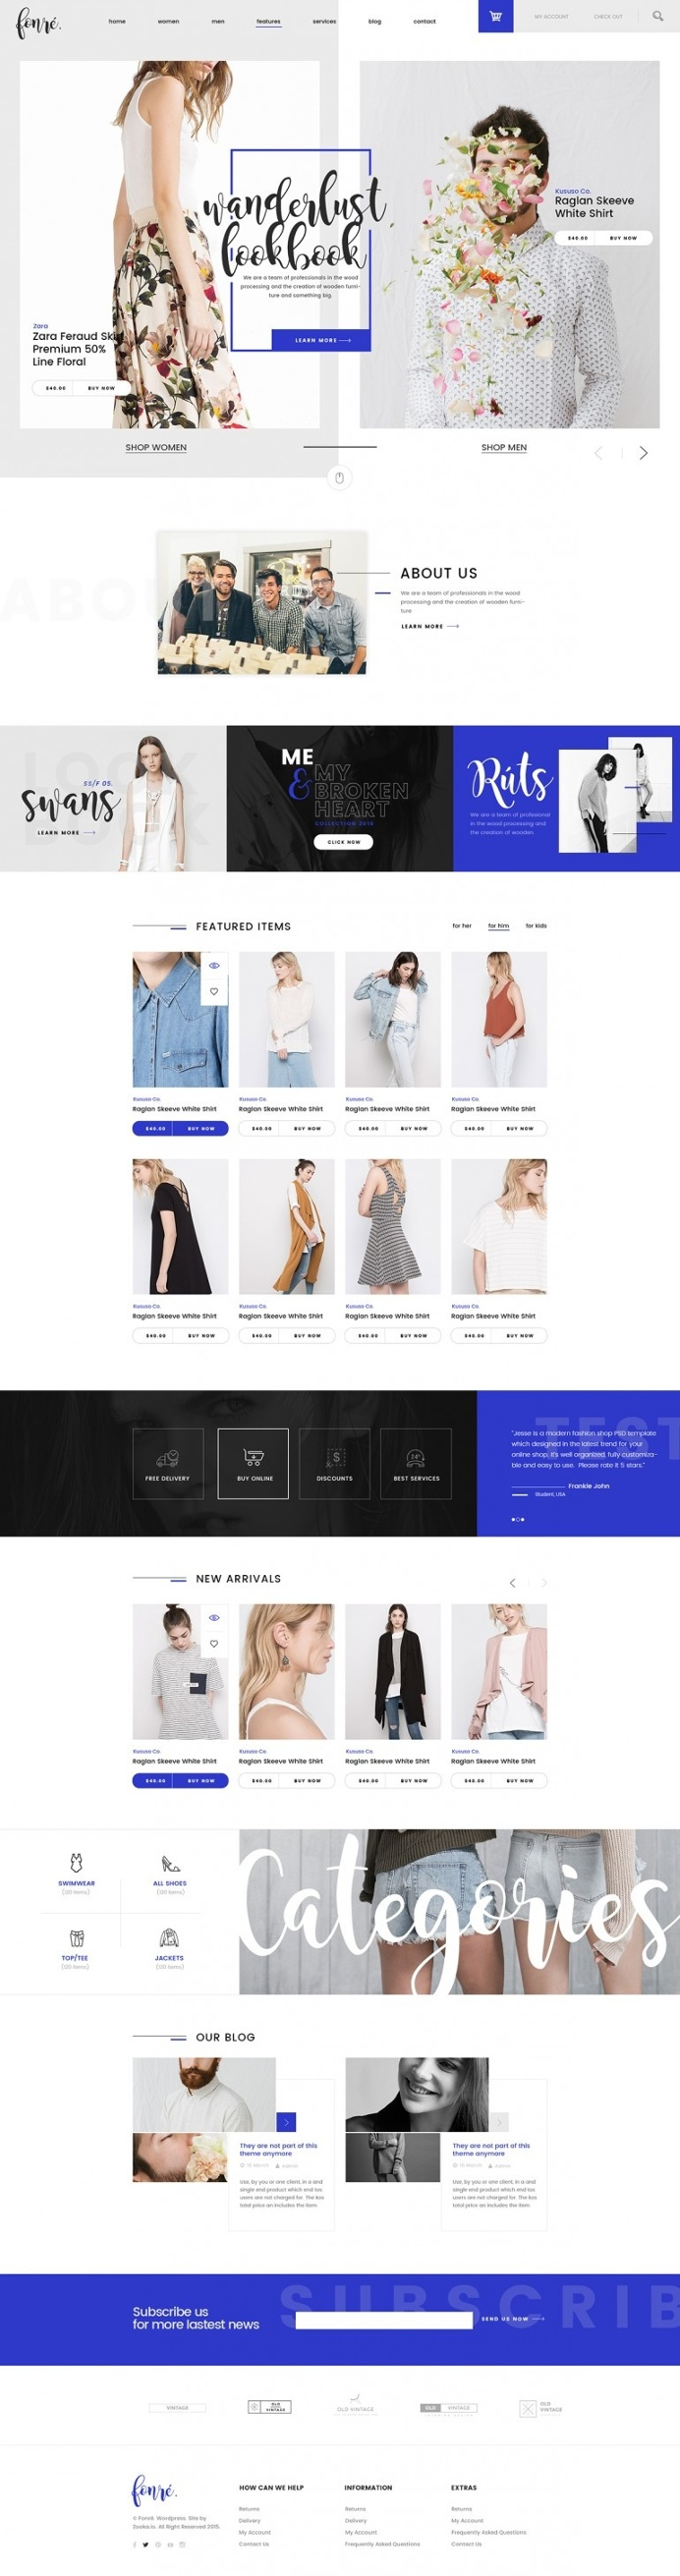 Fonre – Creative Online Shop